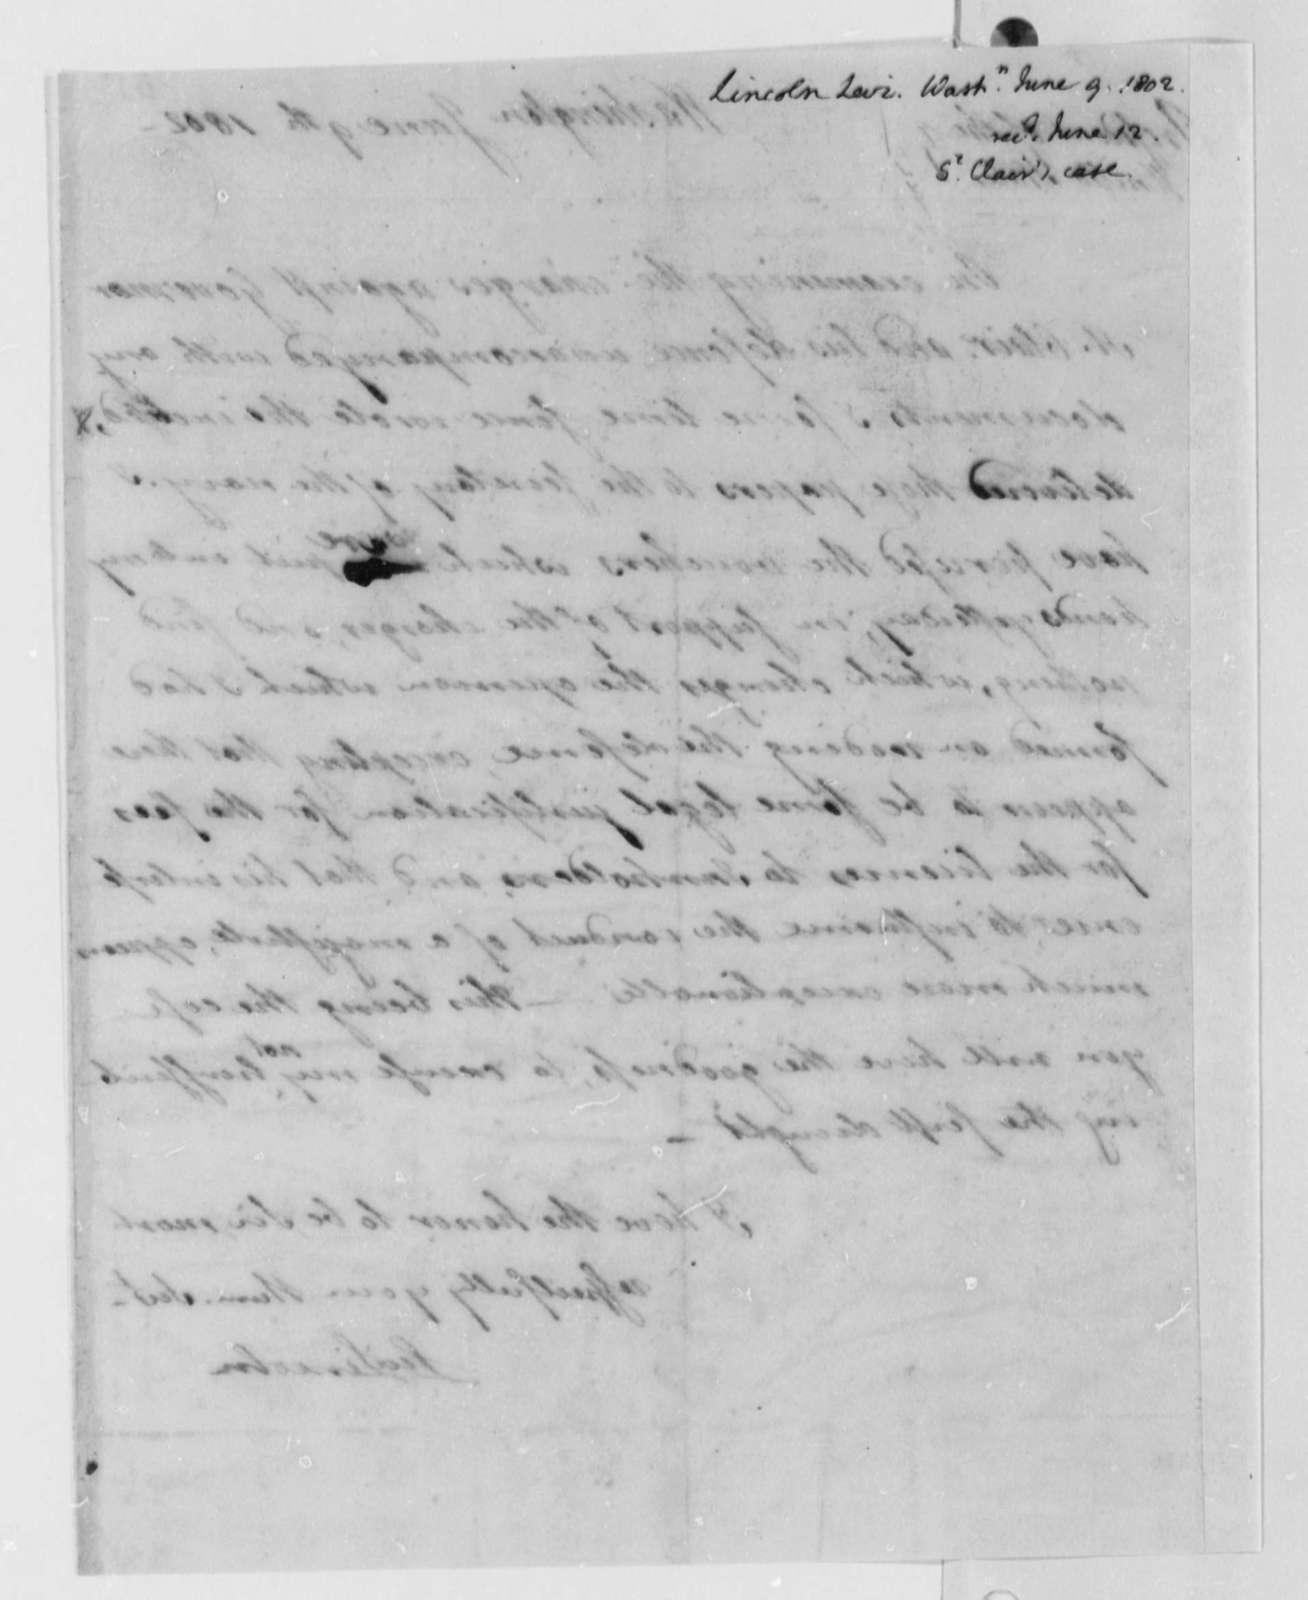 Levi Lincoln to Thomas Jefferson, June 9, 1802